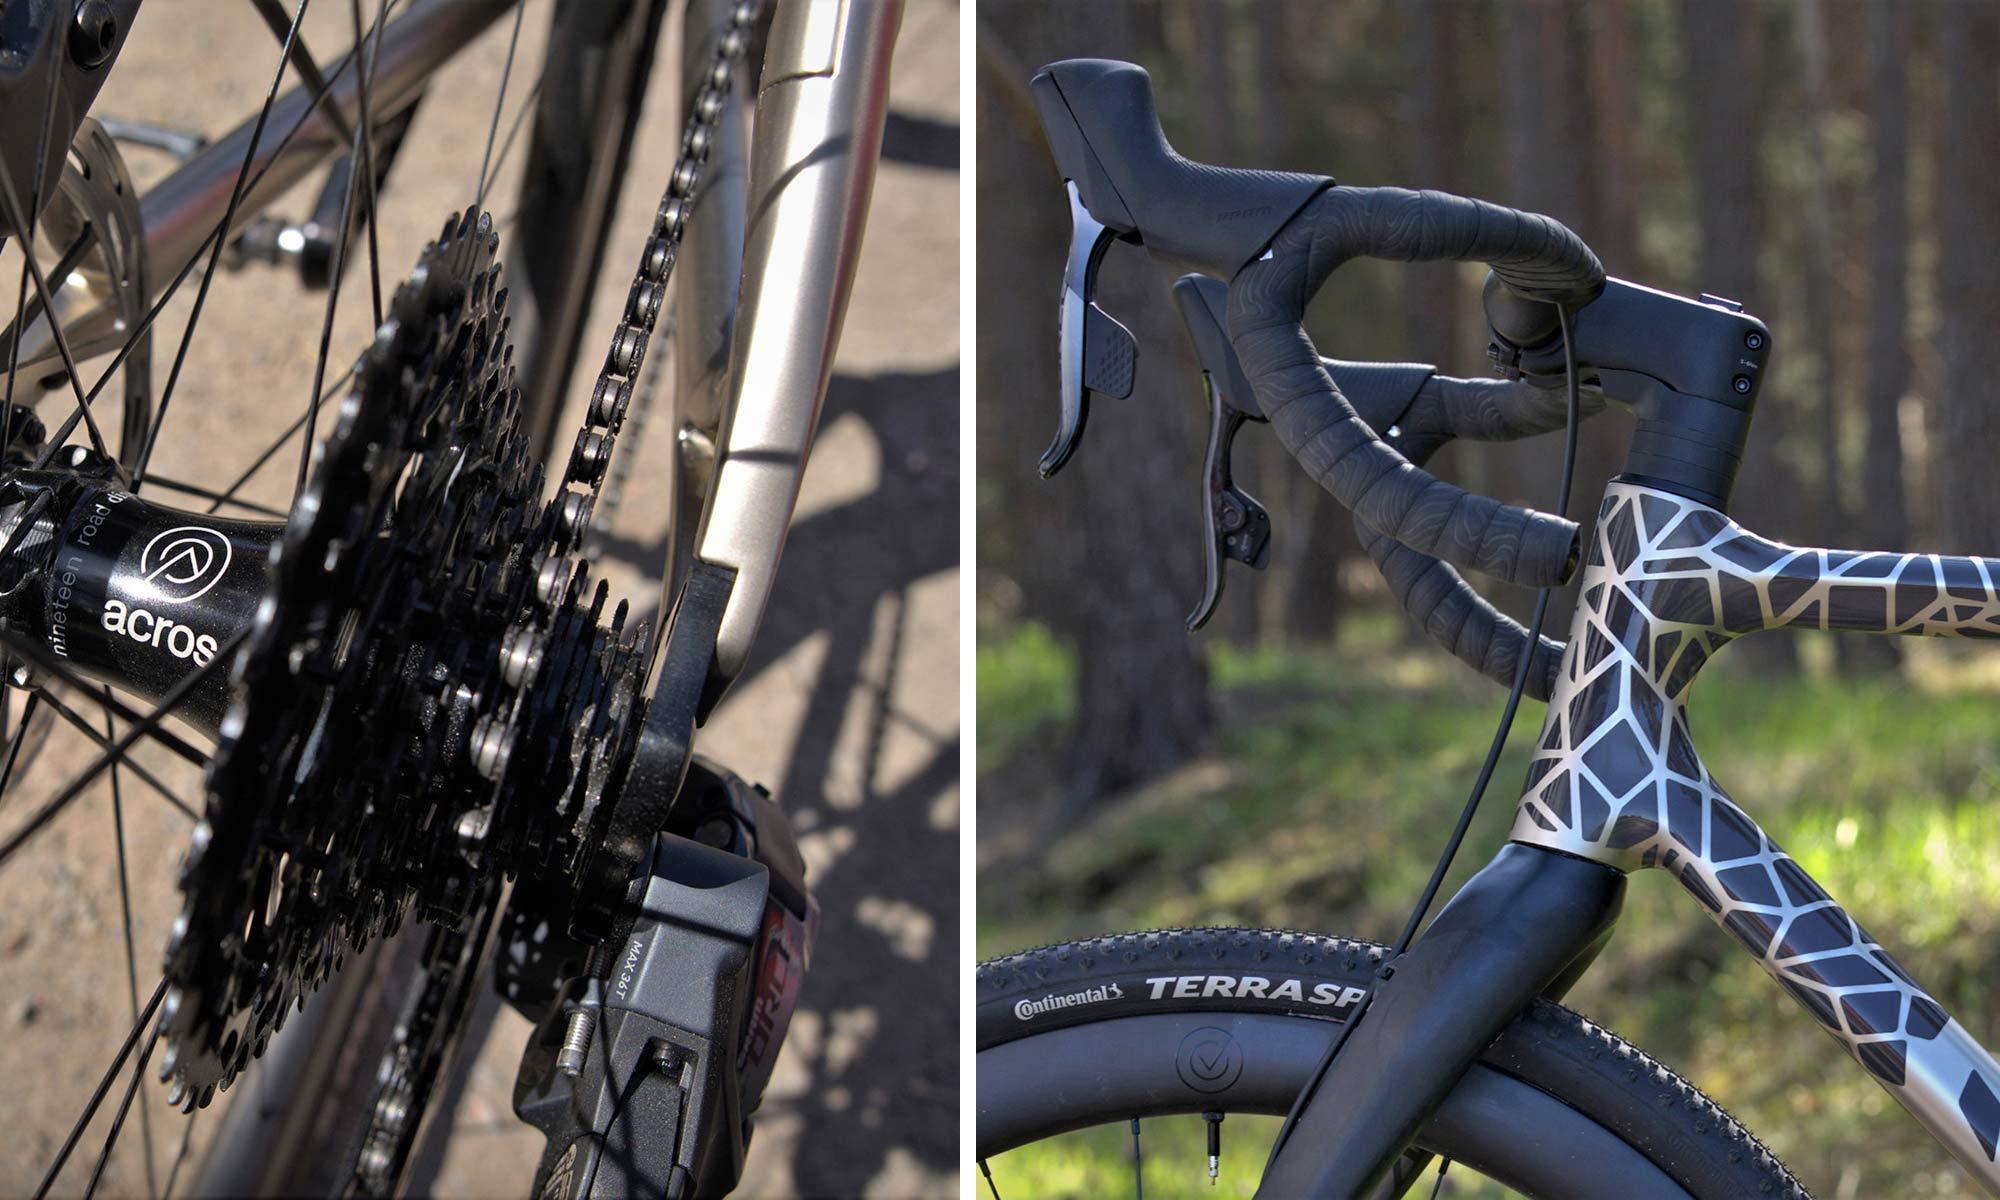 Urwahn Acros EDT gravel bike, limited edition 3D-printed steel no-seattube gravel road adventure bike,details